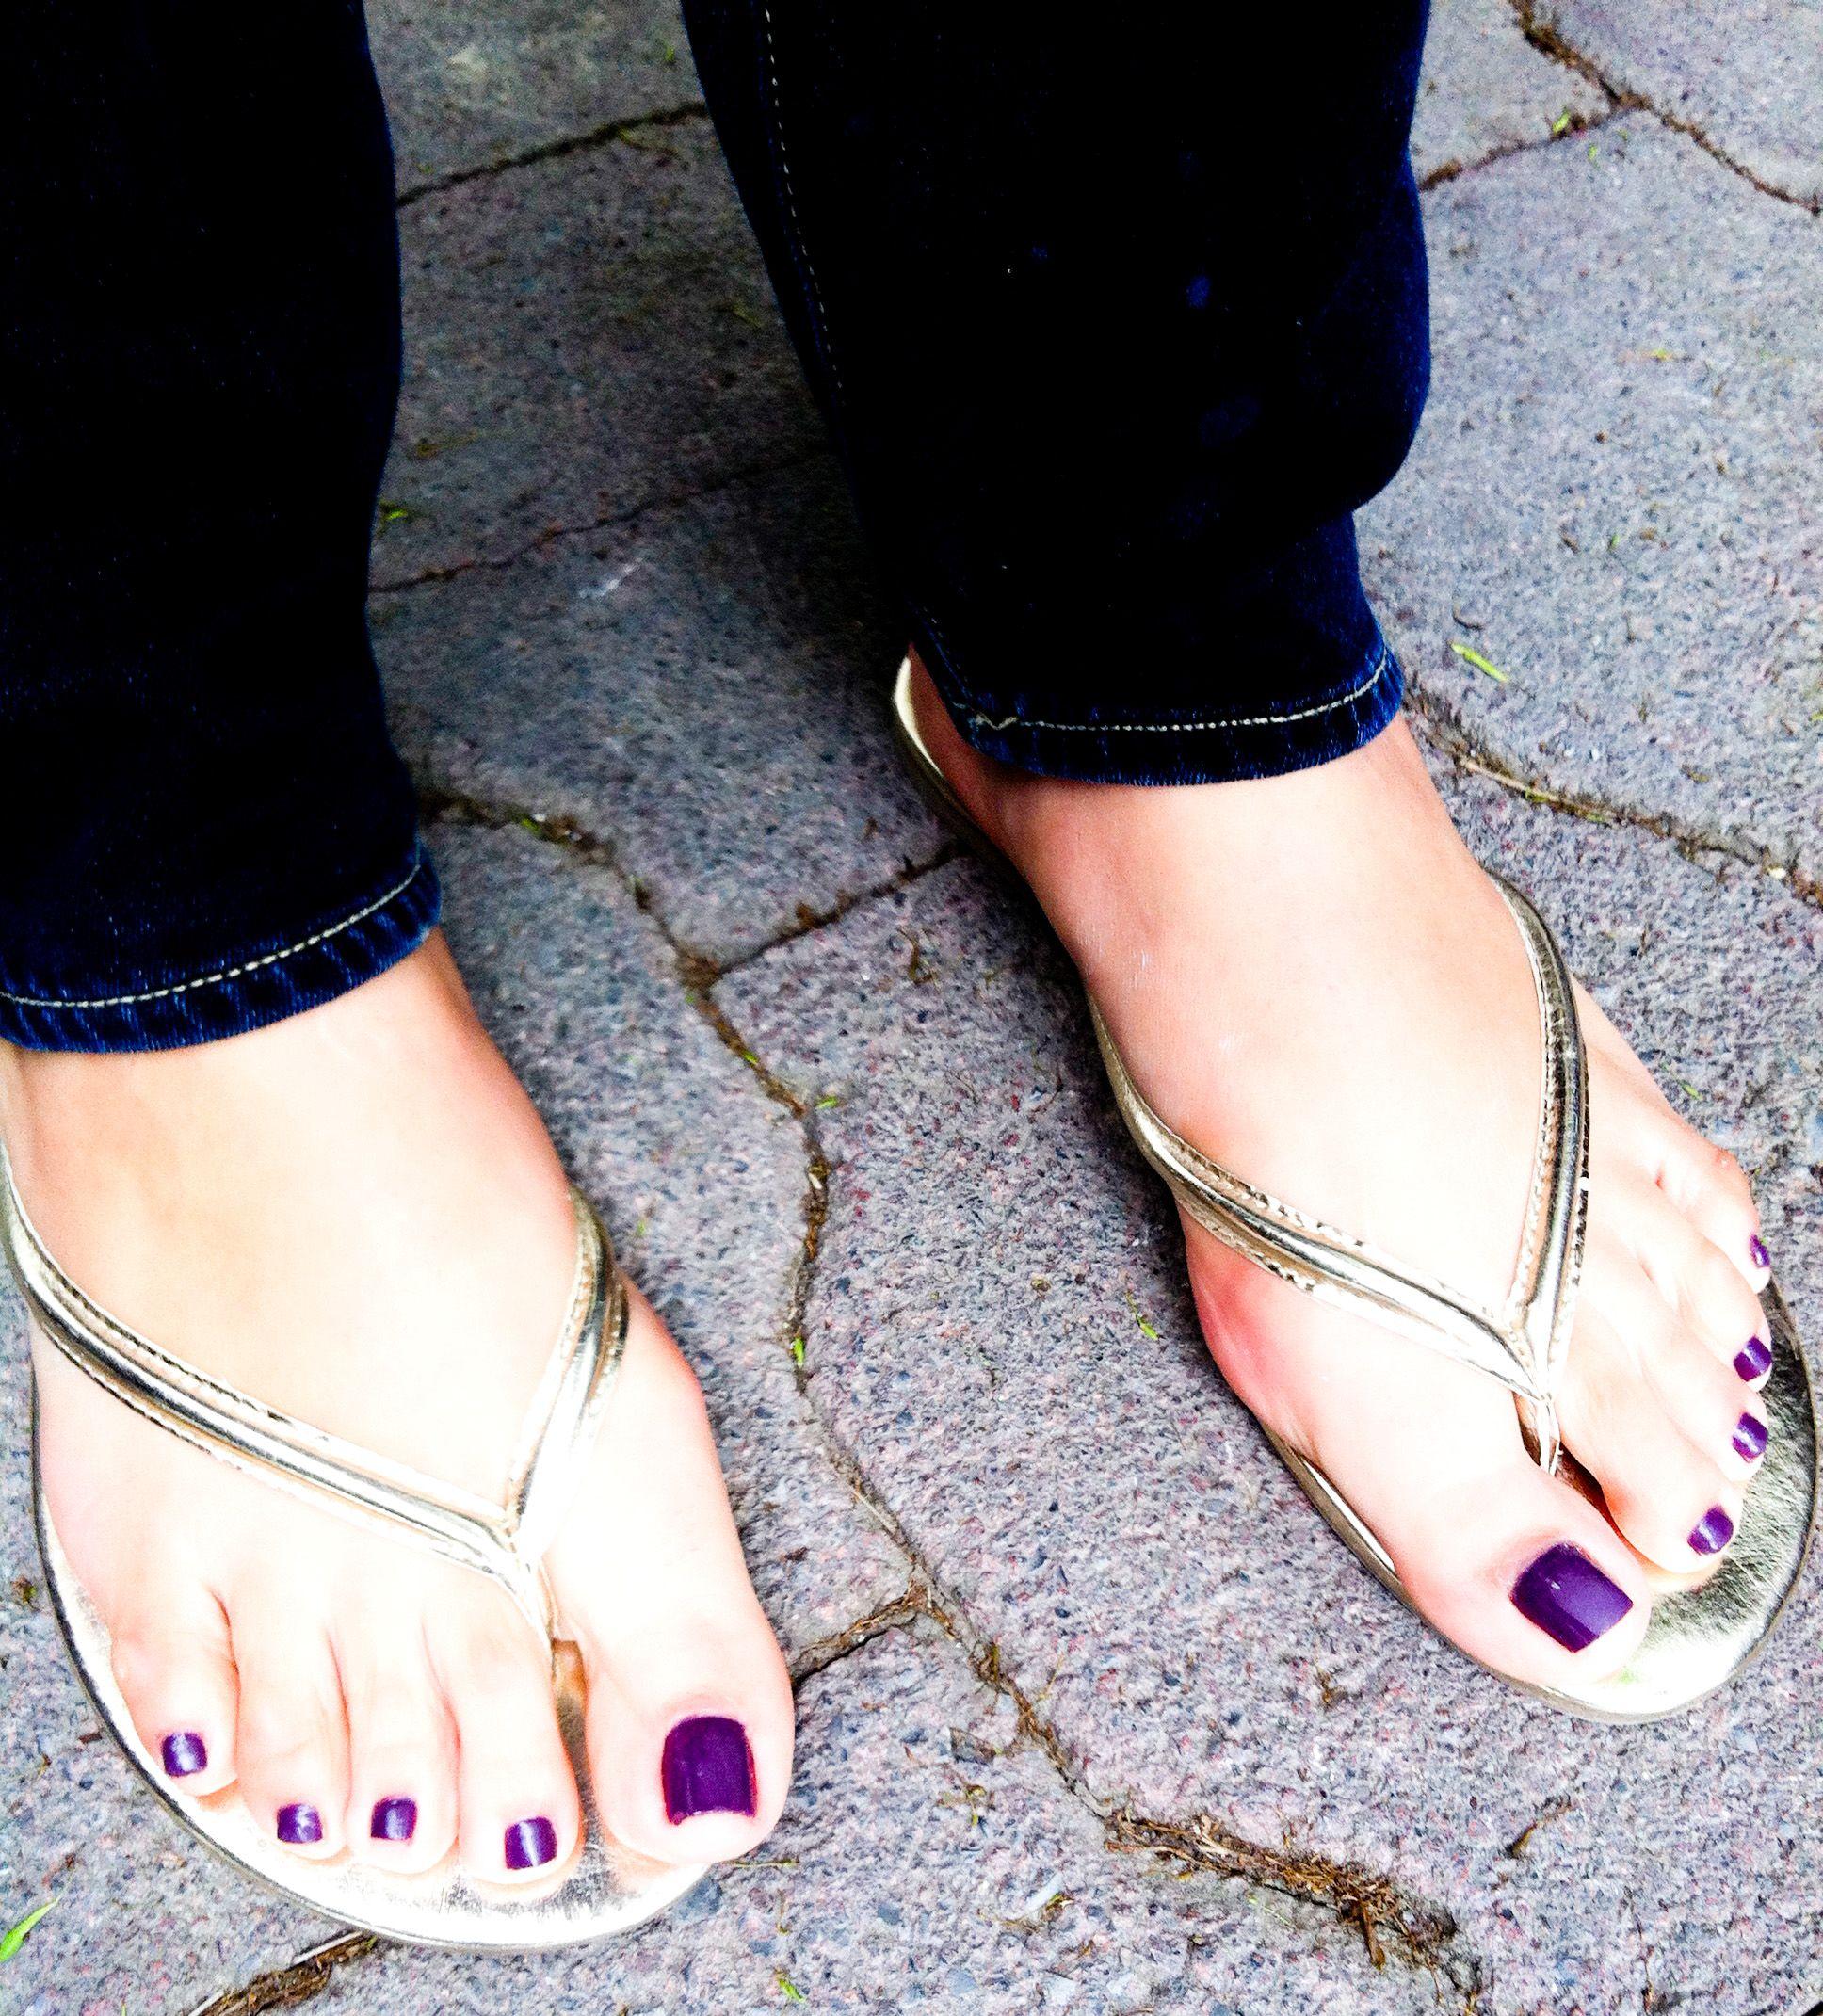 Purple Color In My Feet